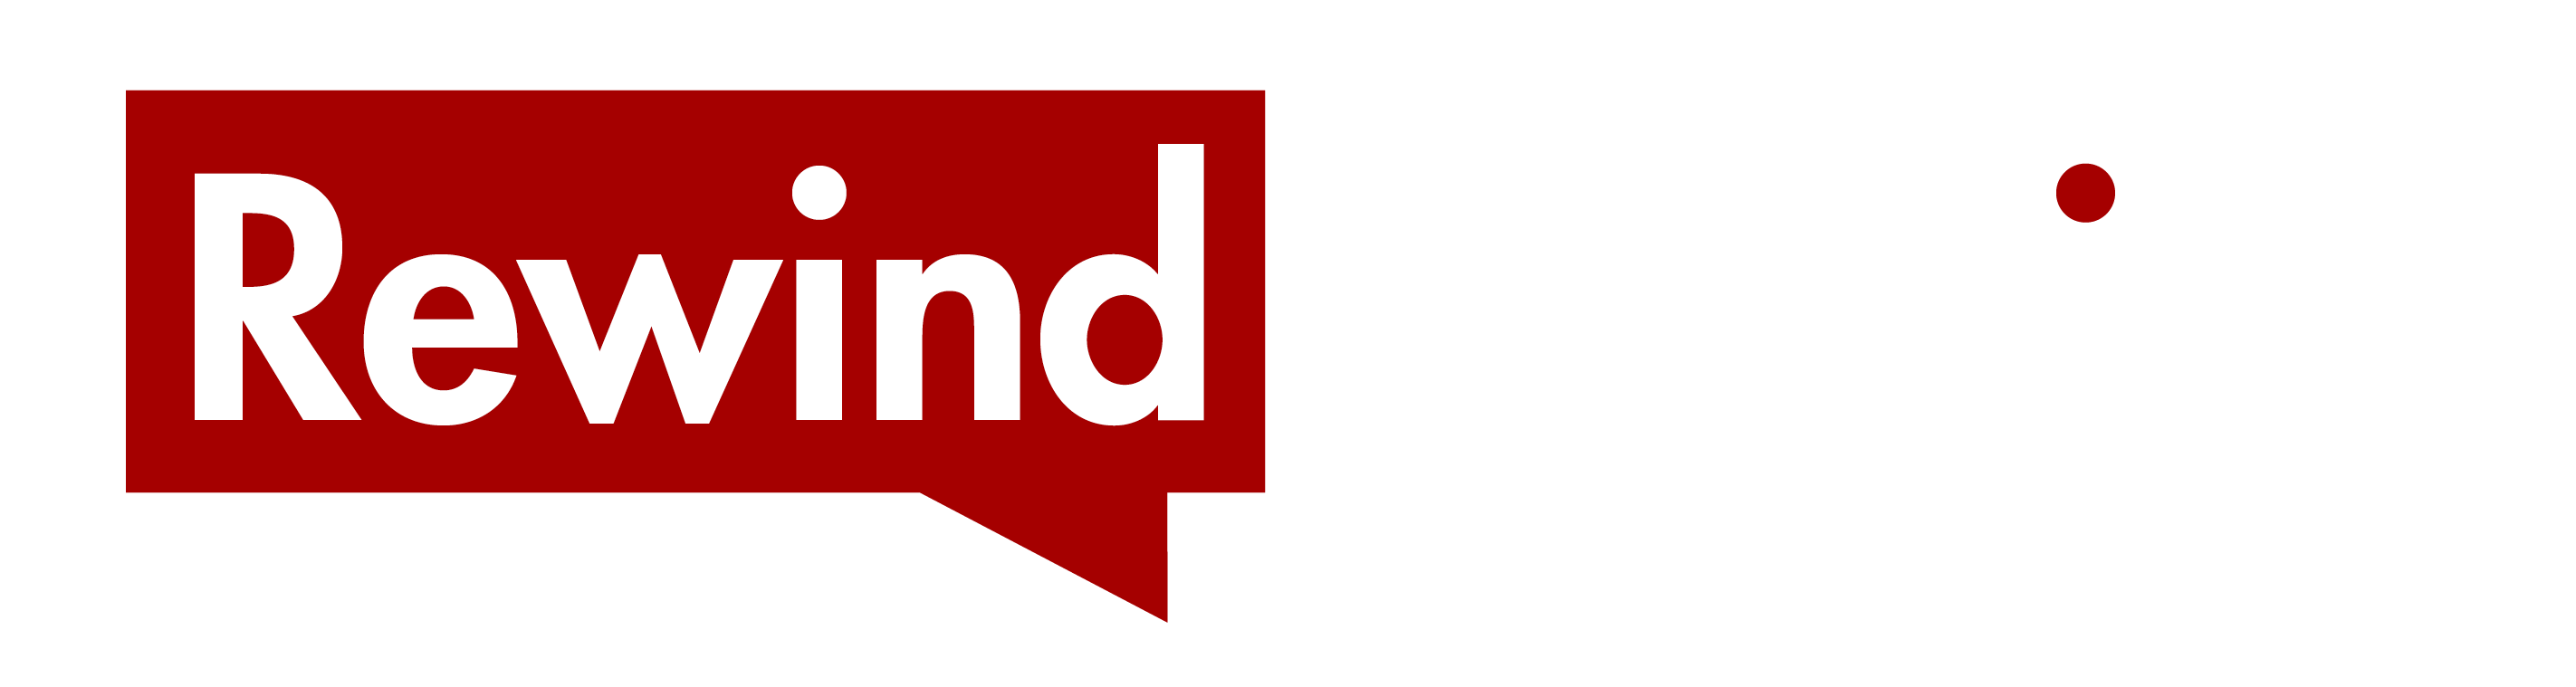 Rewind Creative